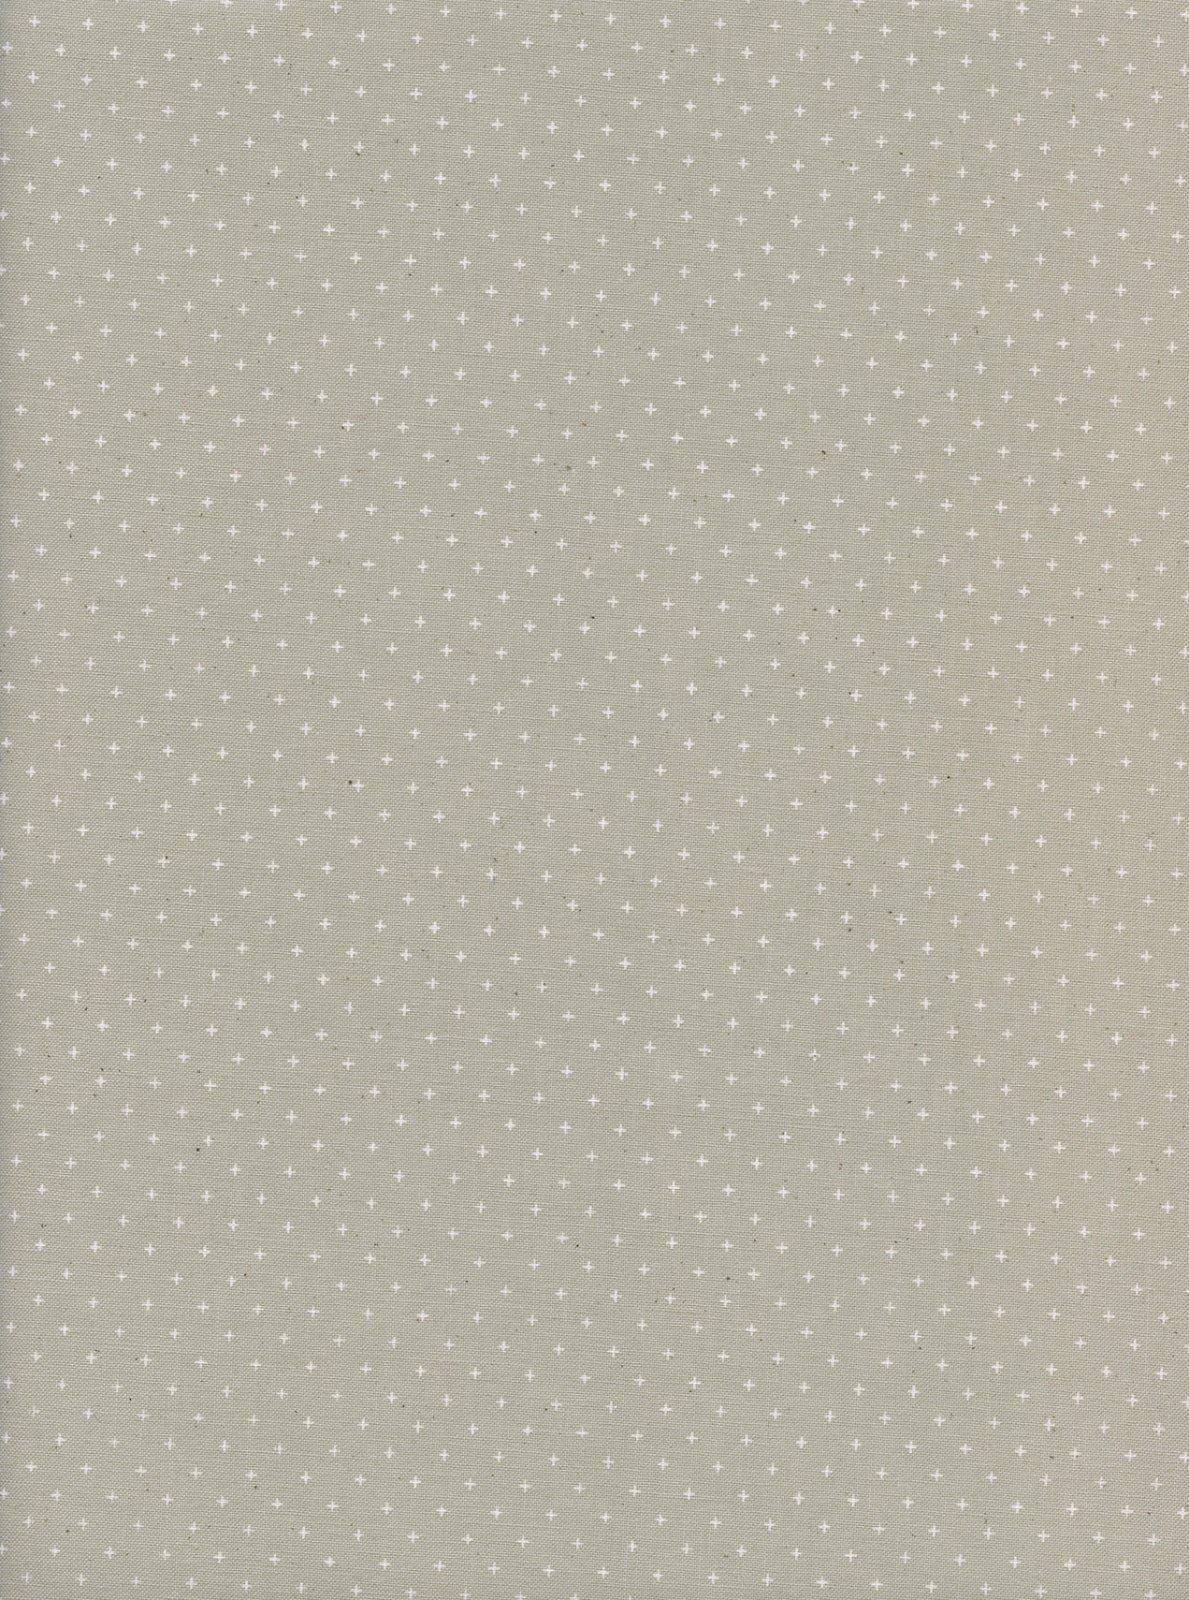 COTTON + STEEL - BASICS - ADD IT UP - RAINY DAY - 5093 009